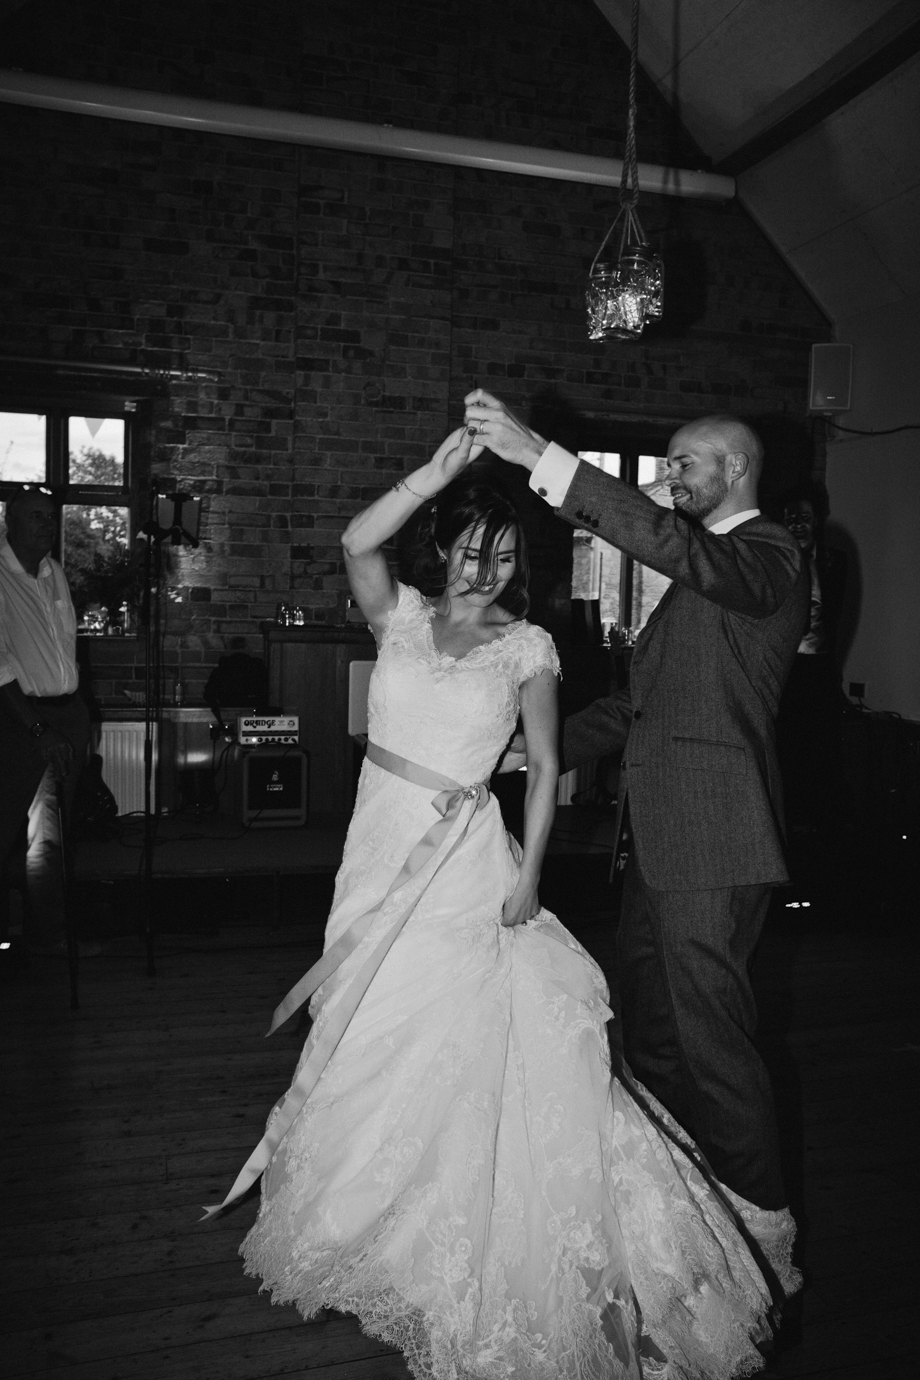 Shropshire-Festival-Wedding-75